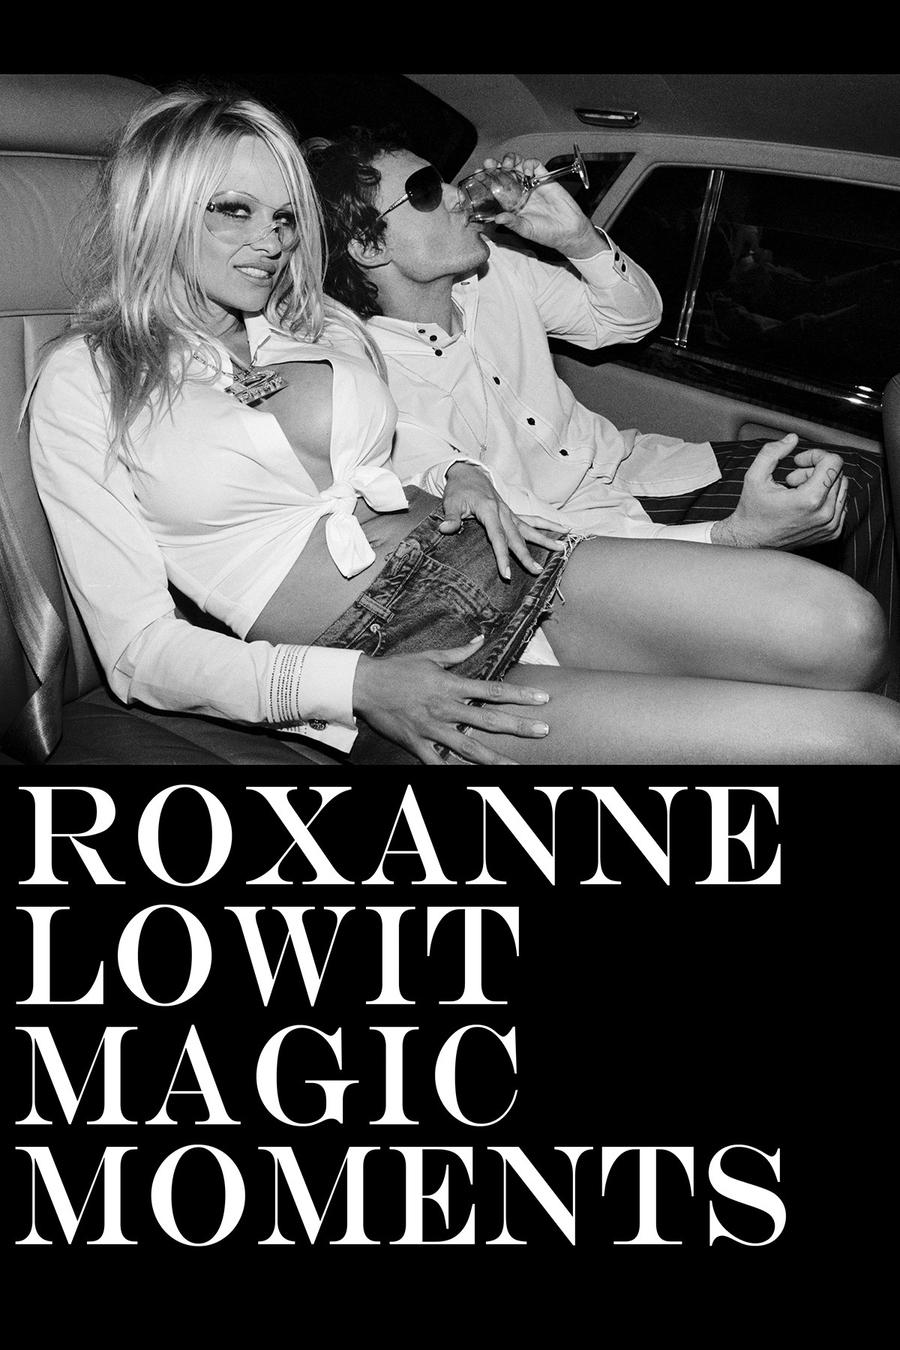 Roxanne Lowit: magic moments